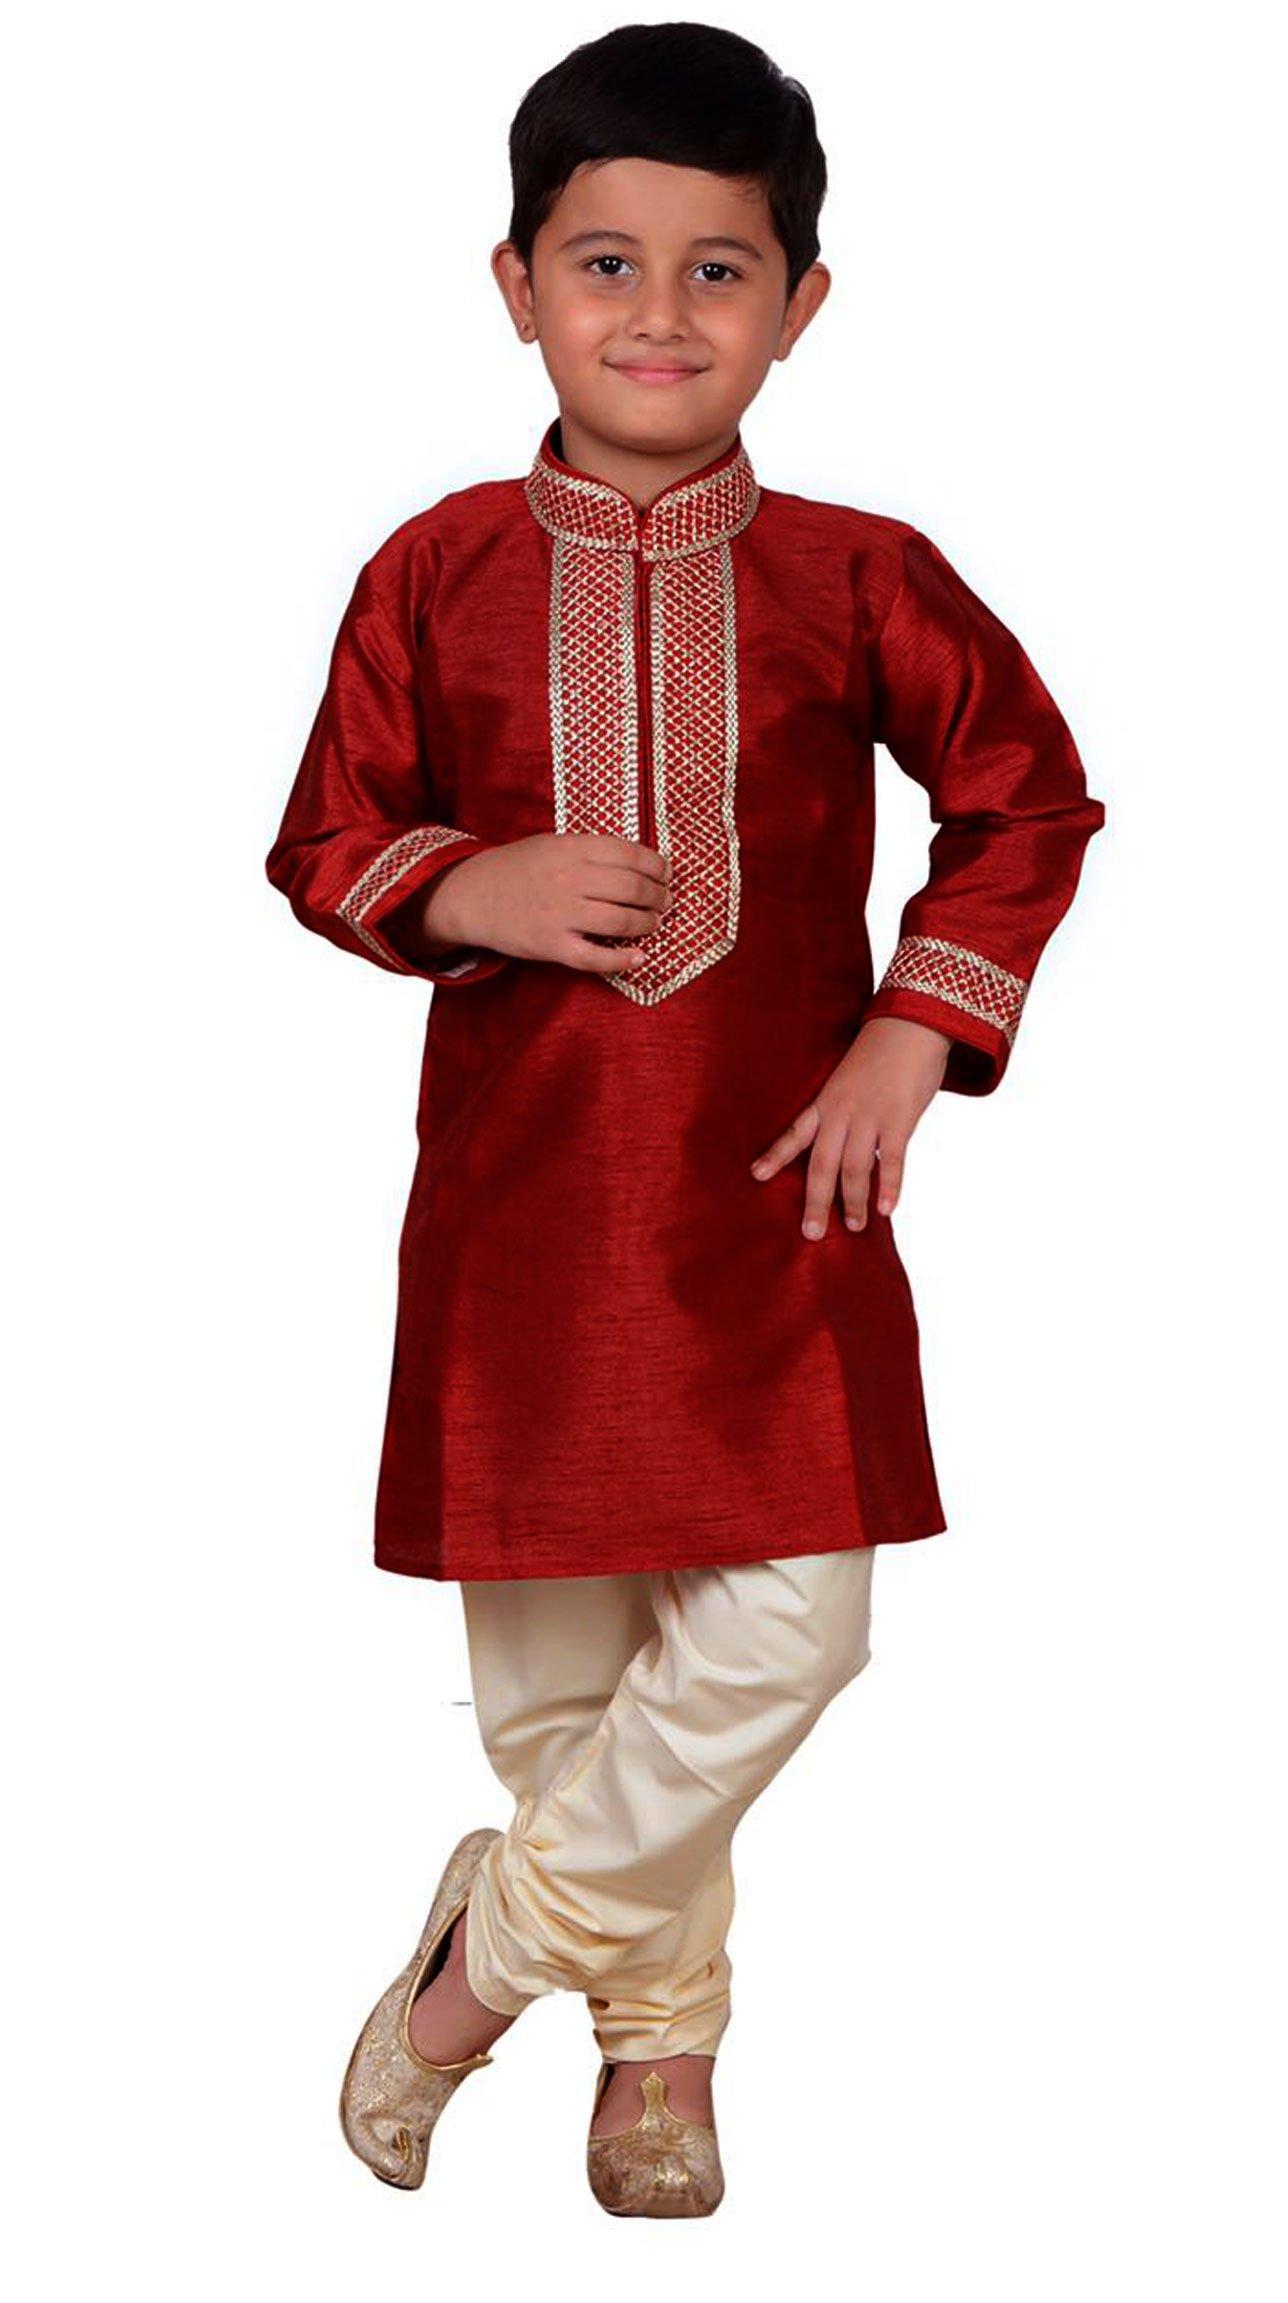 Boys Indian Maroon Sherwani Kurta with Churidar pyjama in fine Art Silk for Bollywood theme party Costume 894 (6 (6 yrs), Maroon)